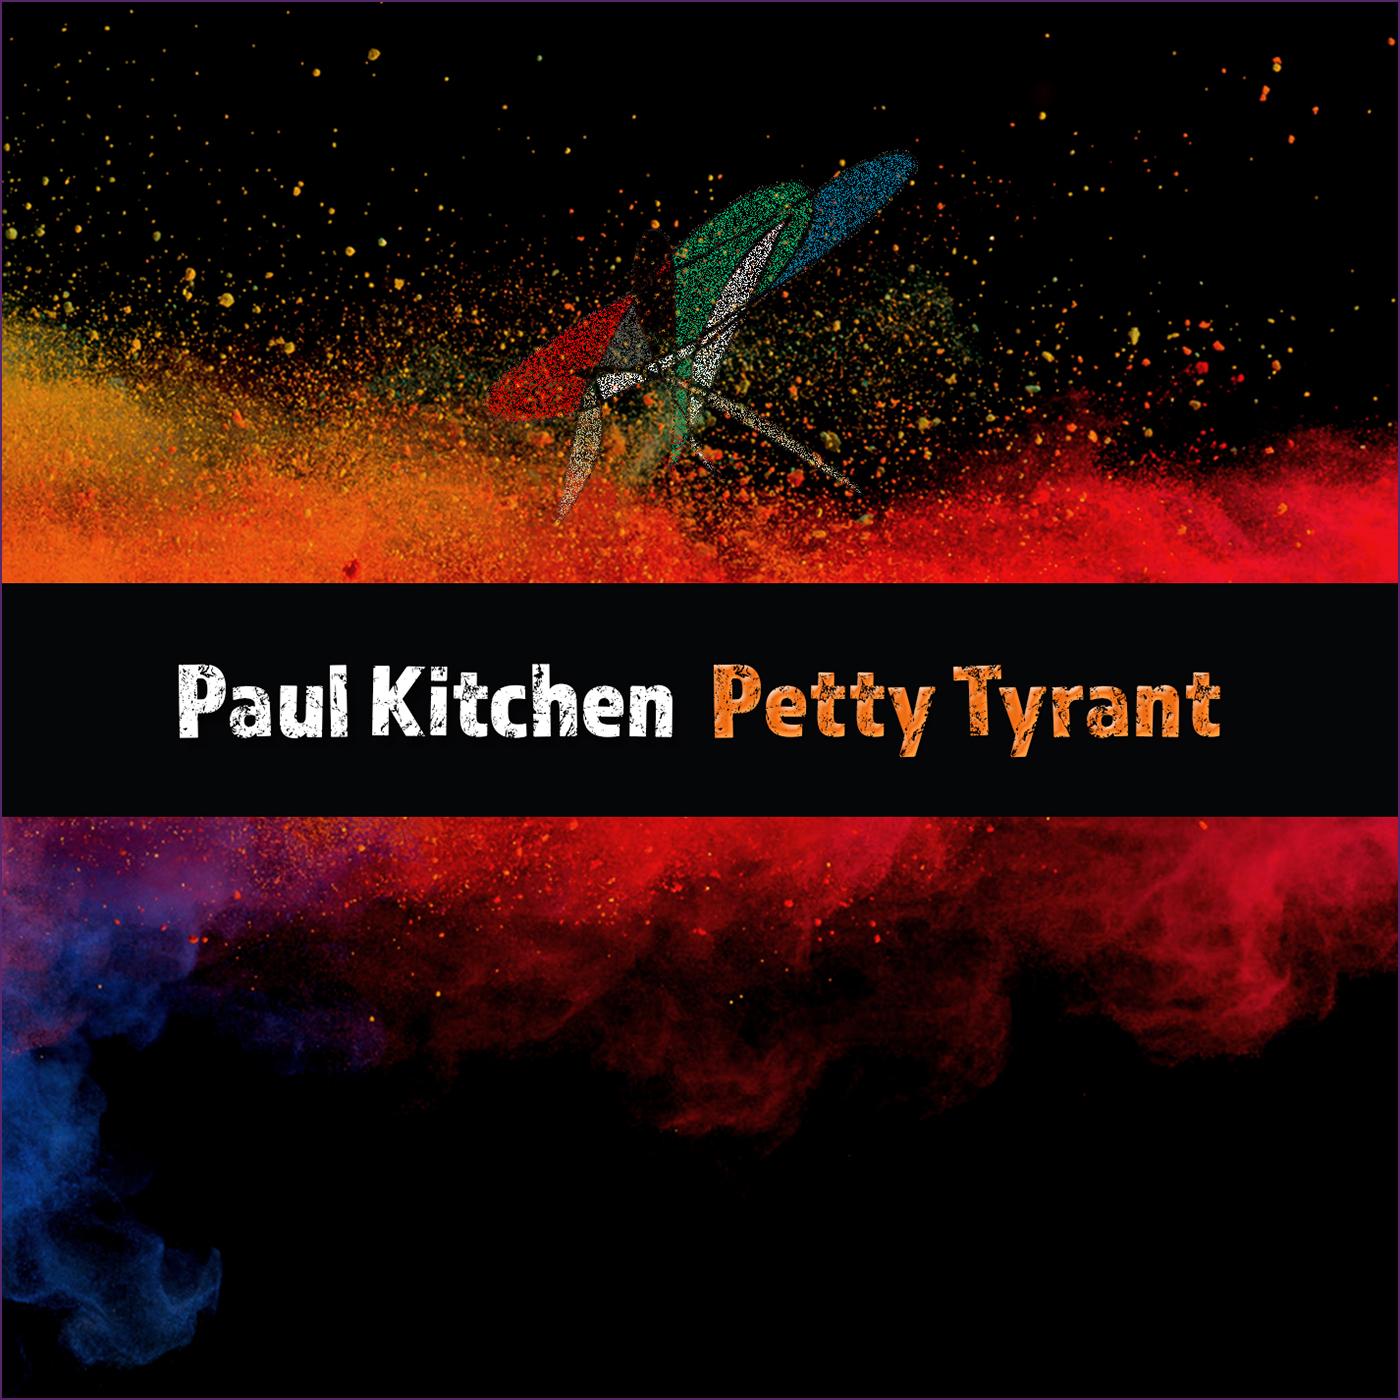 Petty Tyrant